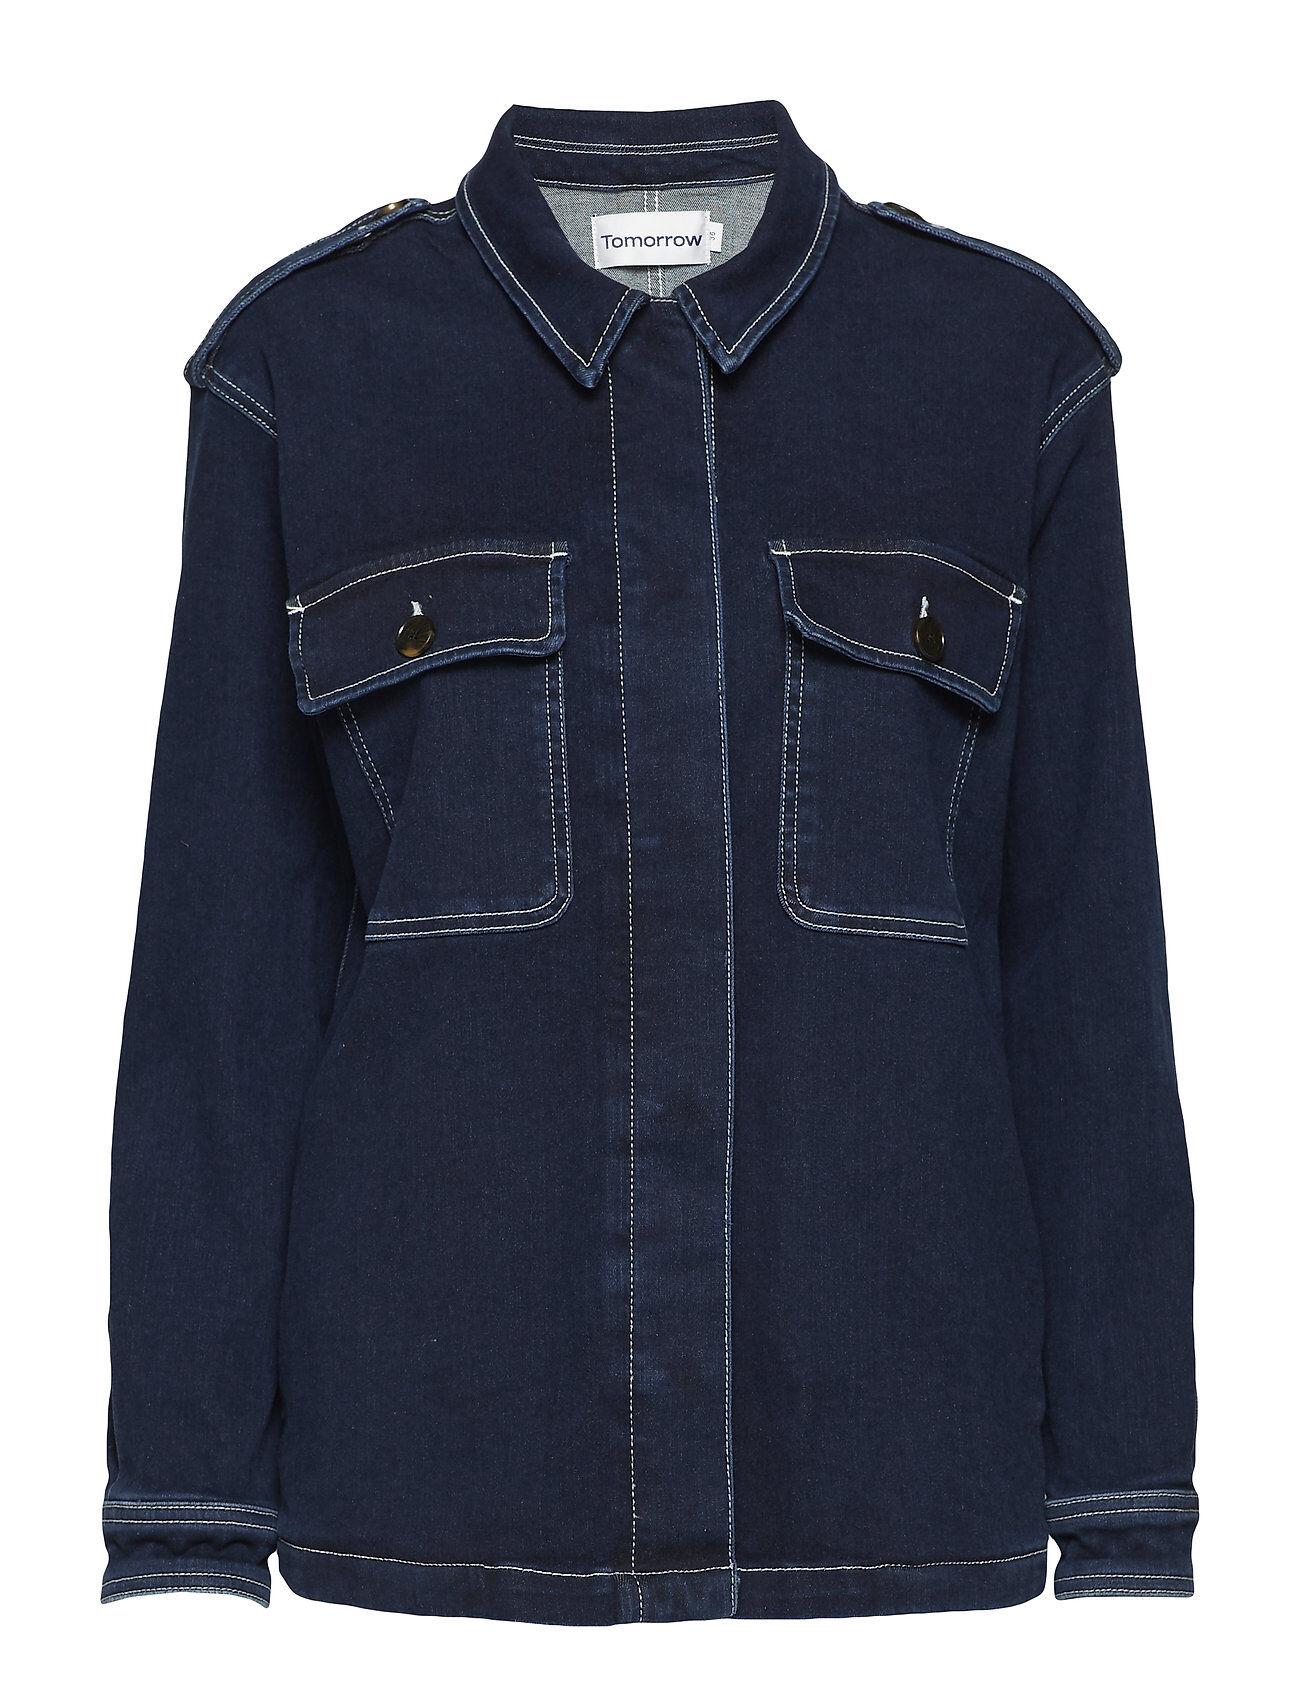 Tomorrow Lincoln Worker Jacket Wash Hounston